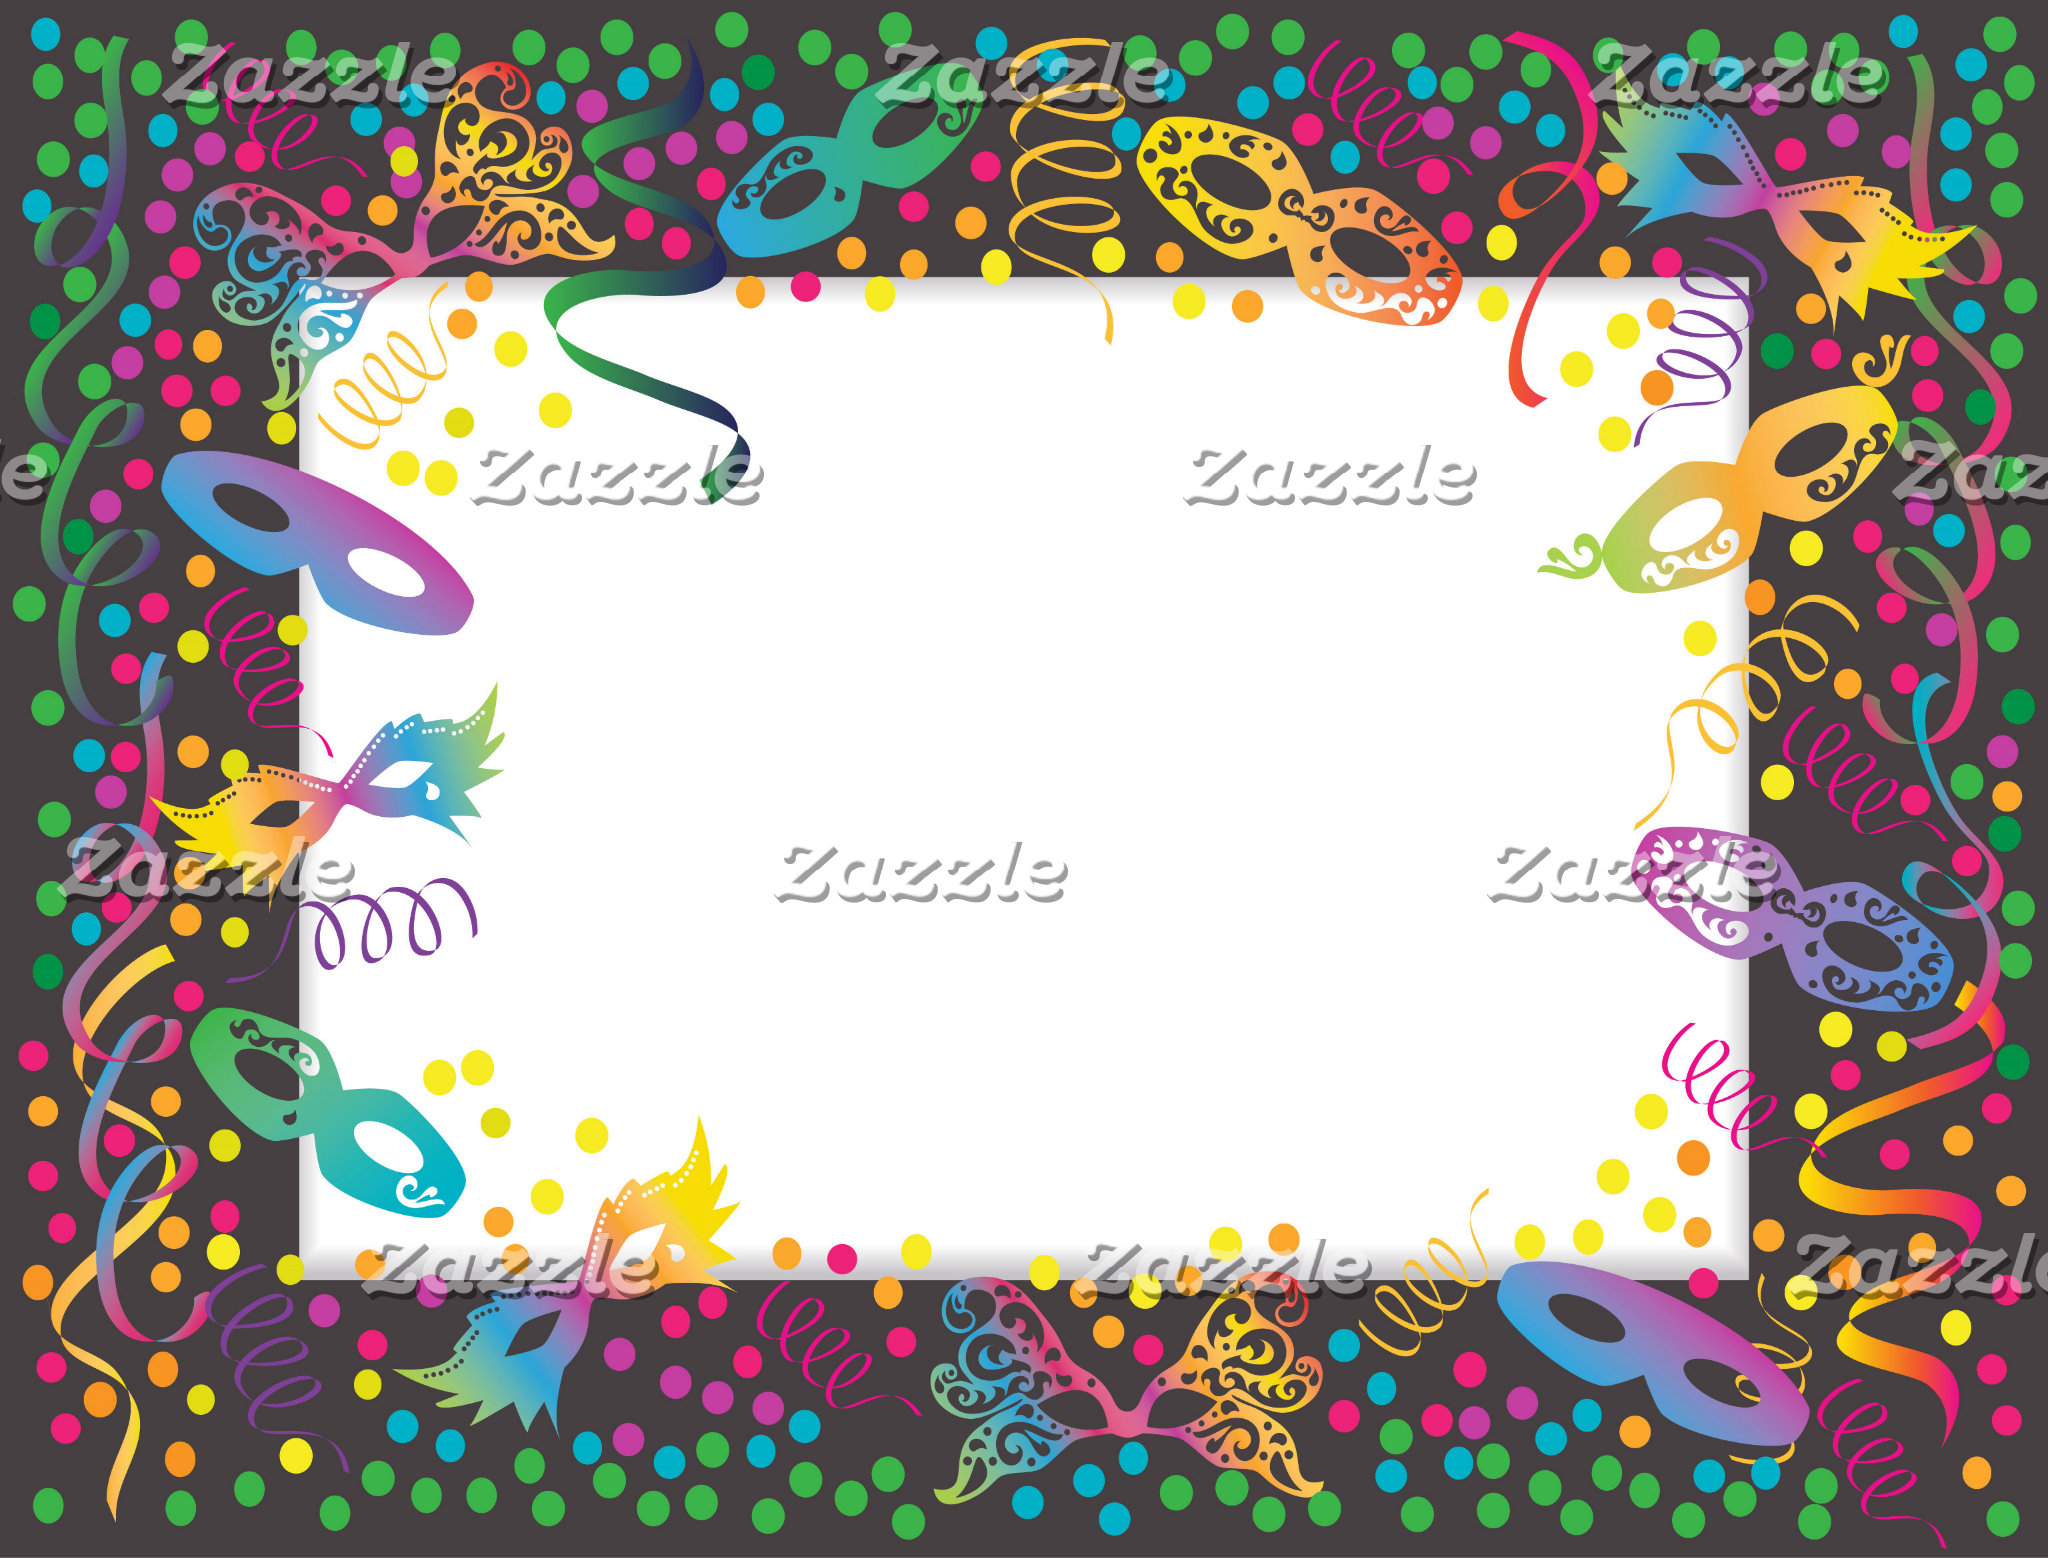 Cards, invitation, postcards, paper stuff